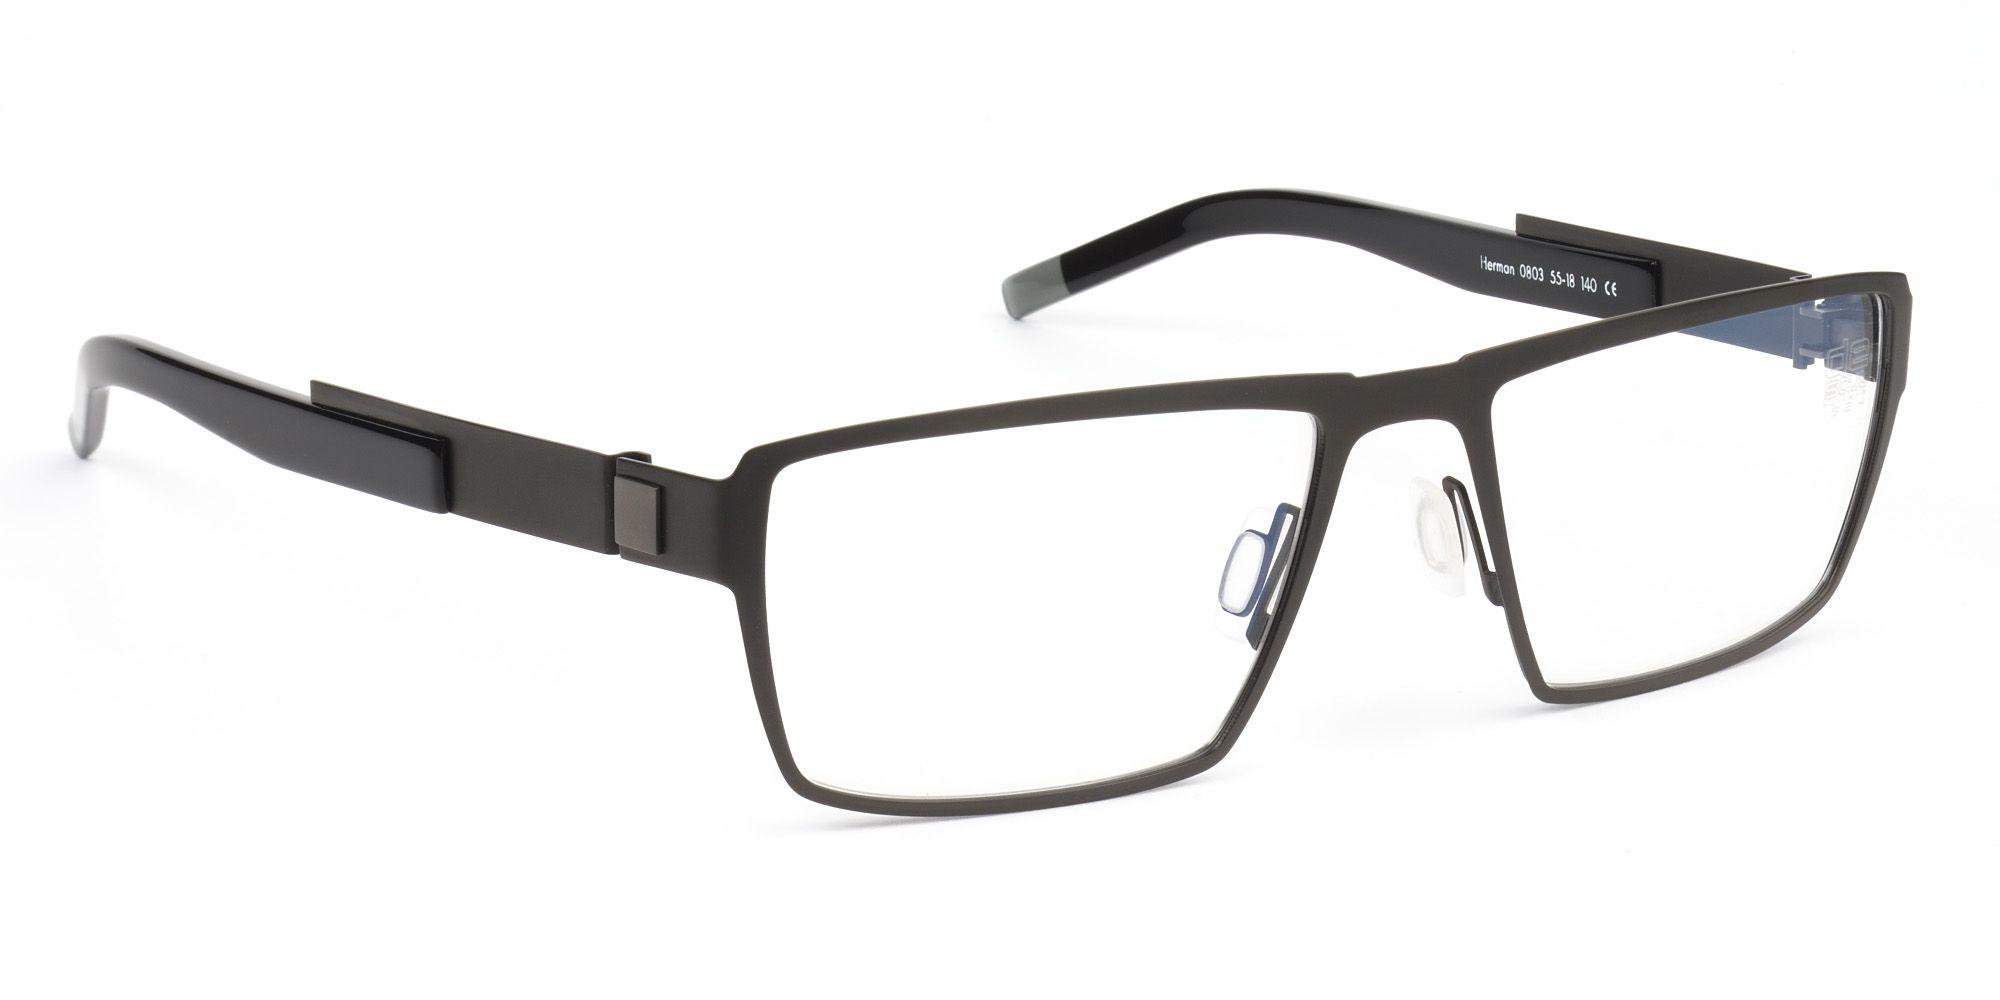 0c5166d13313 De Stijl Holland 1924 eyewear  men eyeglasses frame HERMAN in matte black  metal with black shiny plastic temples covers 0803